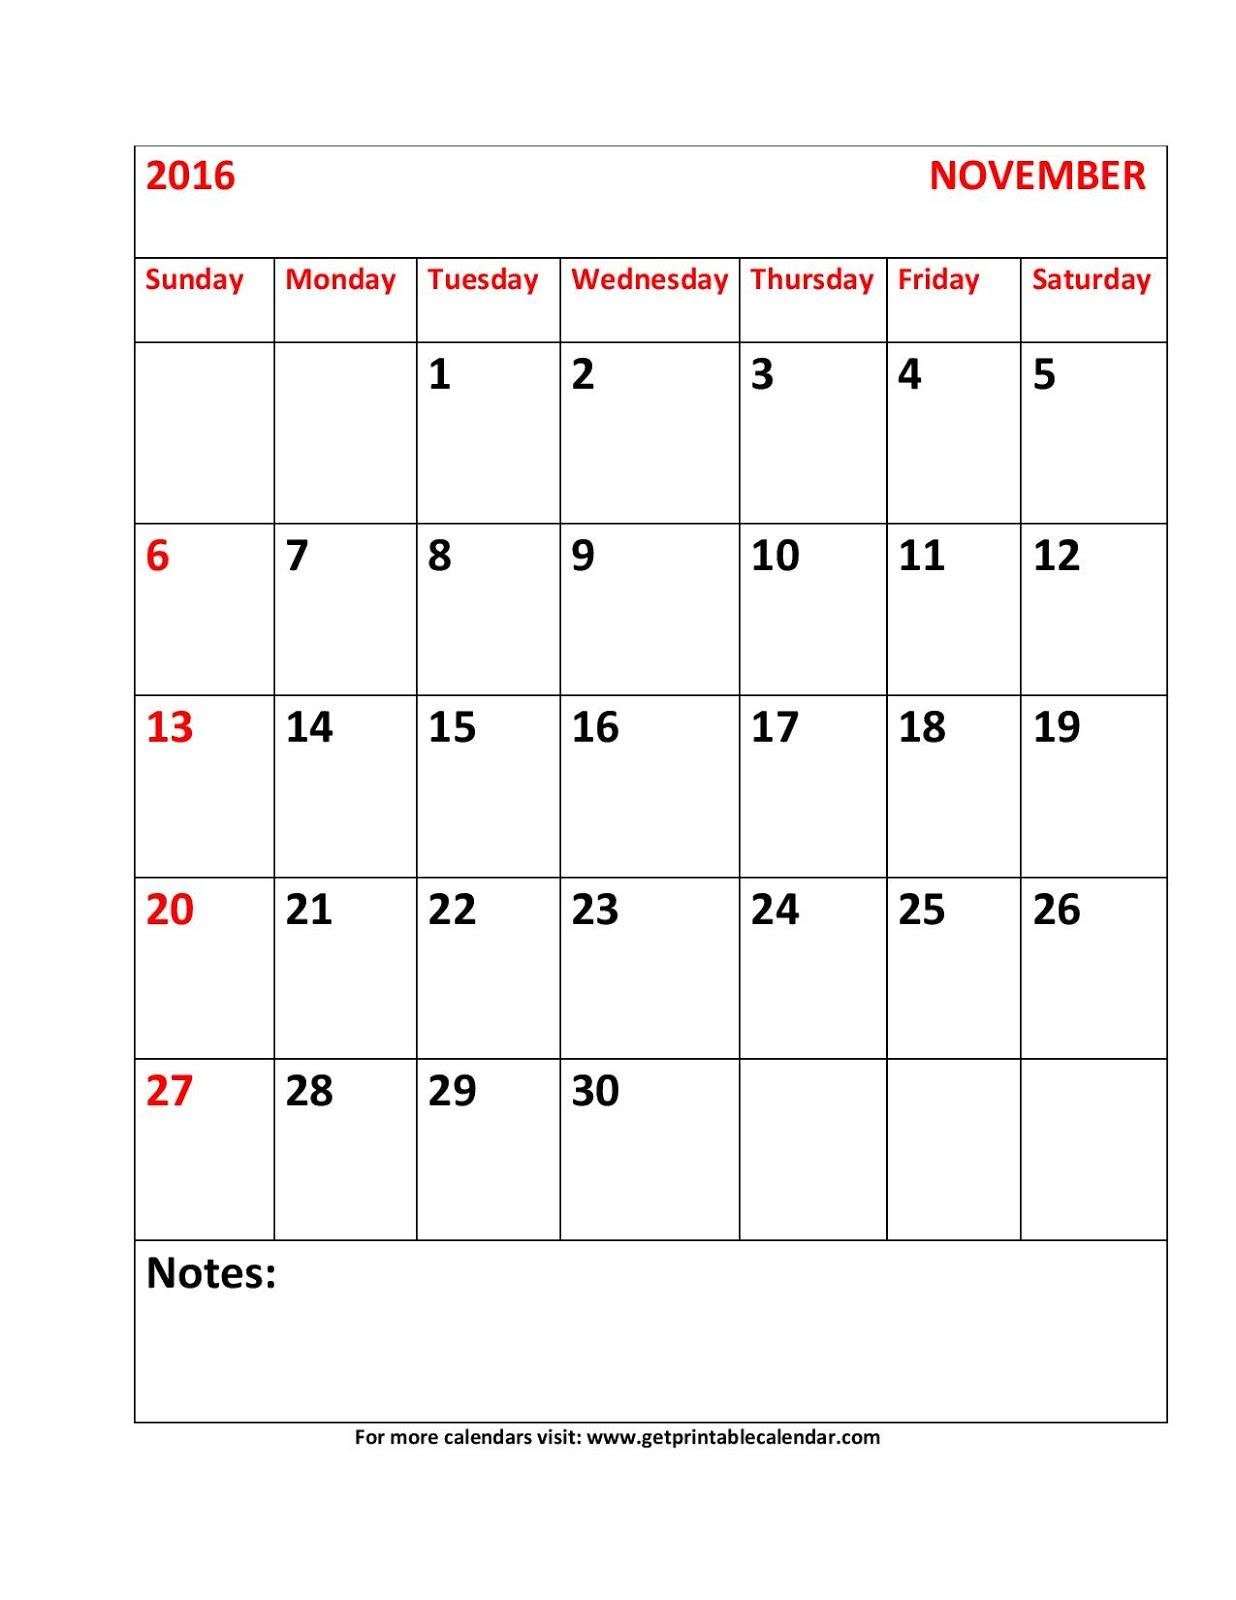 November Calendar 2016 Printable Pdf : Printable calendar november pdf